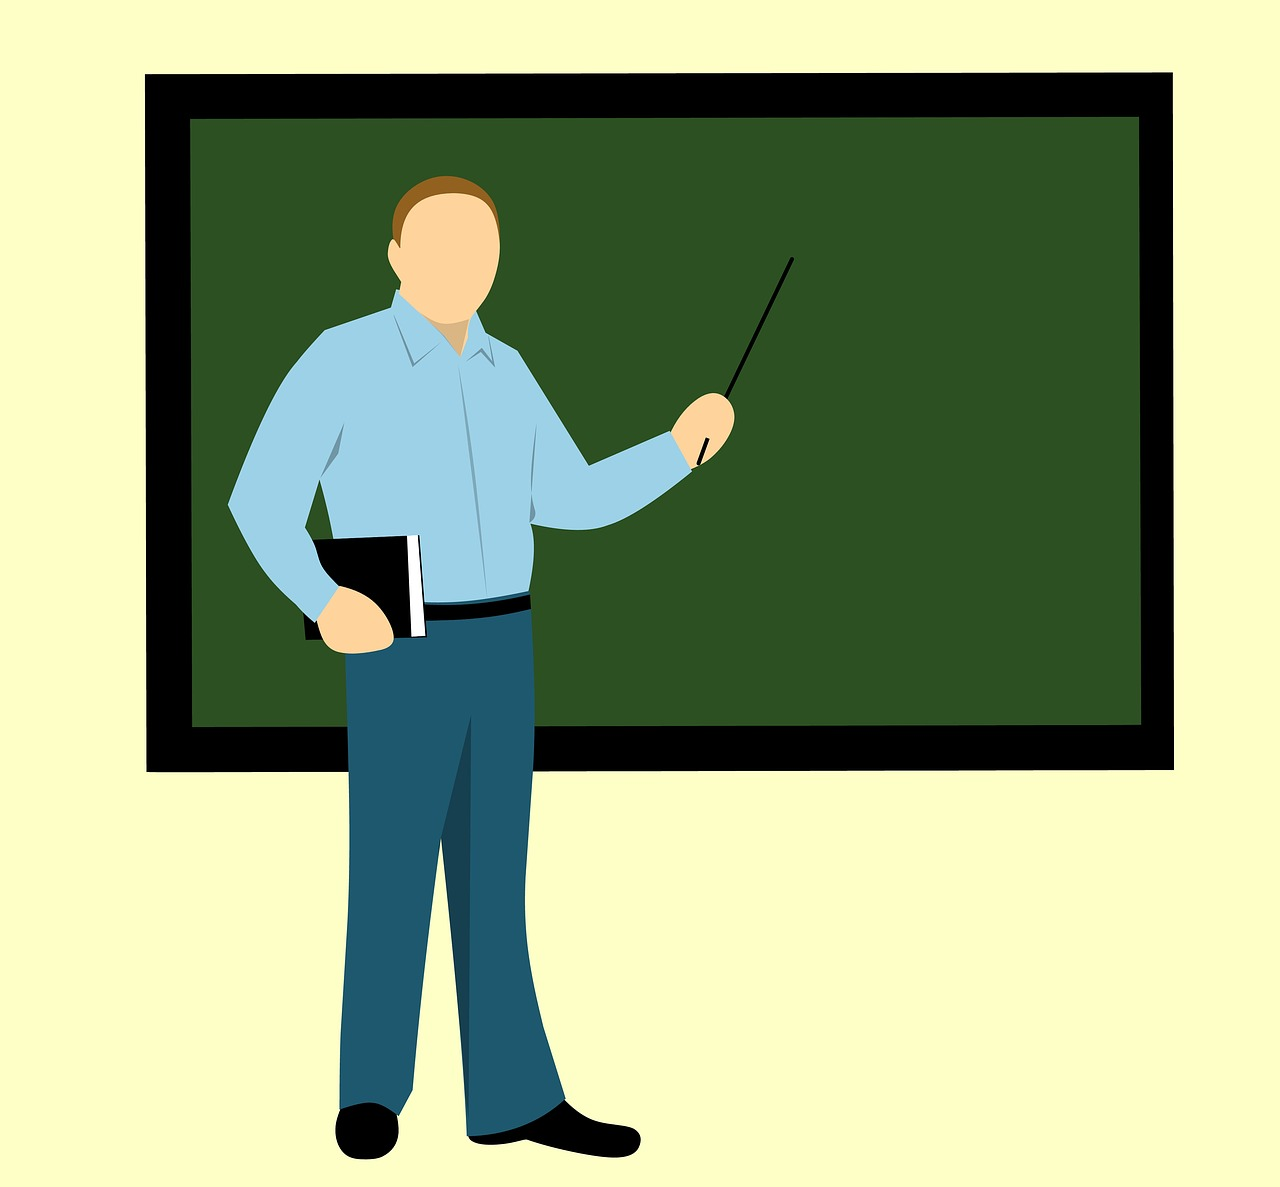 преподаватель мужчина картинки презентация стать